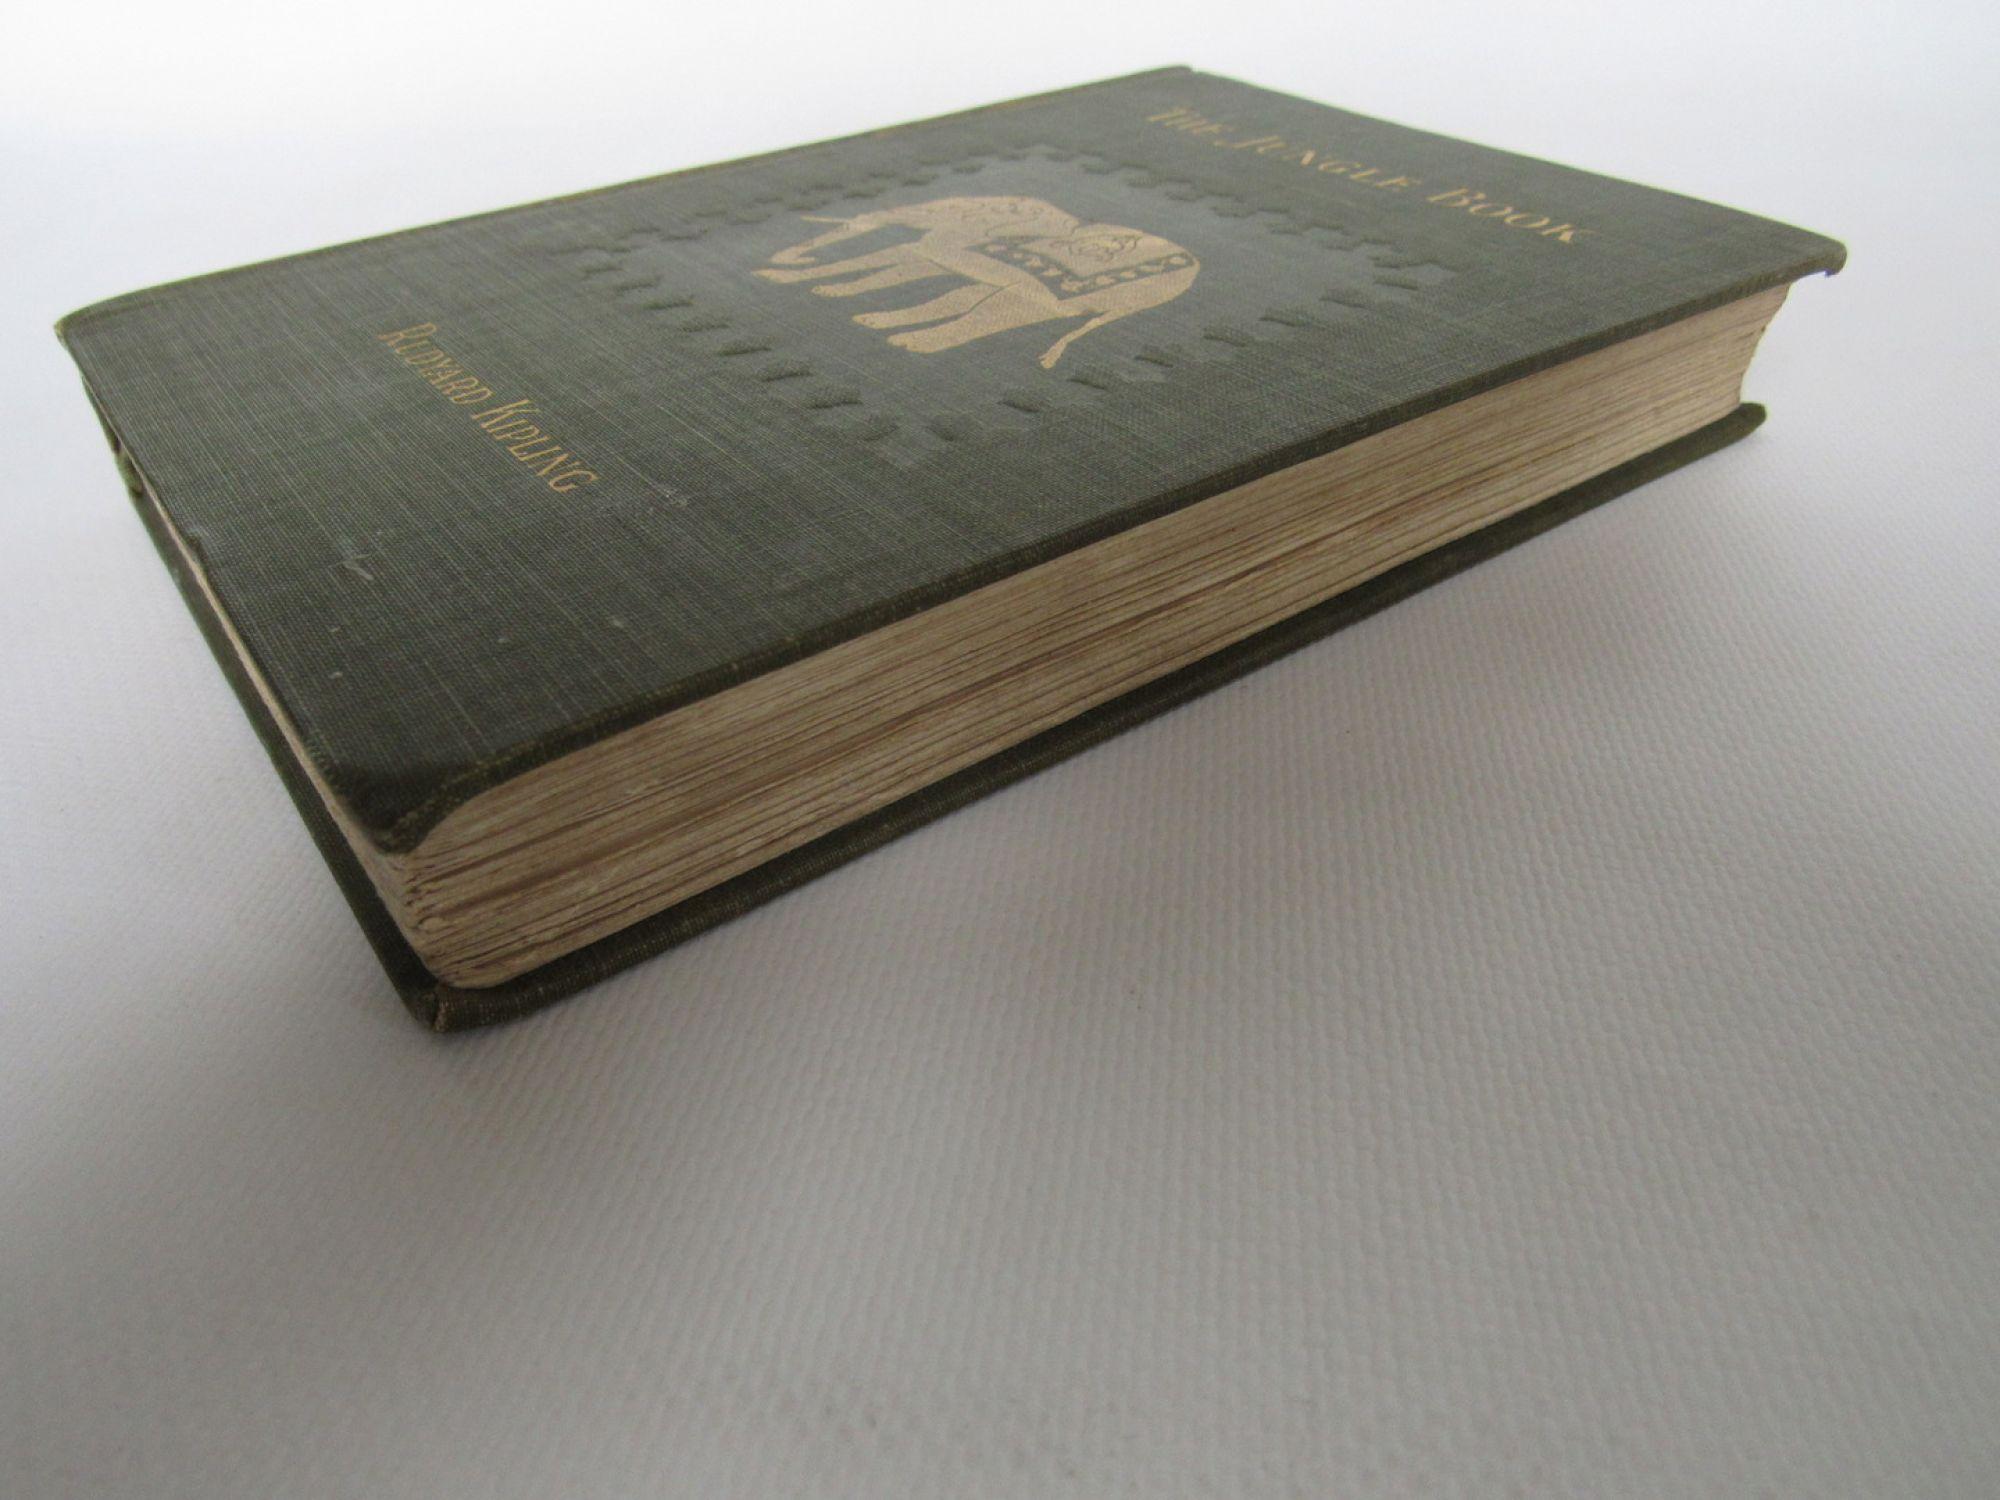 9d9c2fa74 KIPLING : The jungle book - First edition - Edition-Originale.com